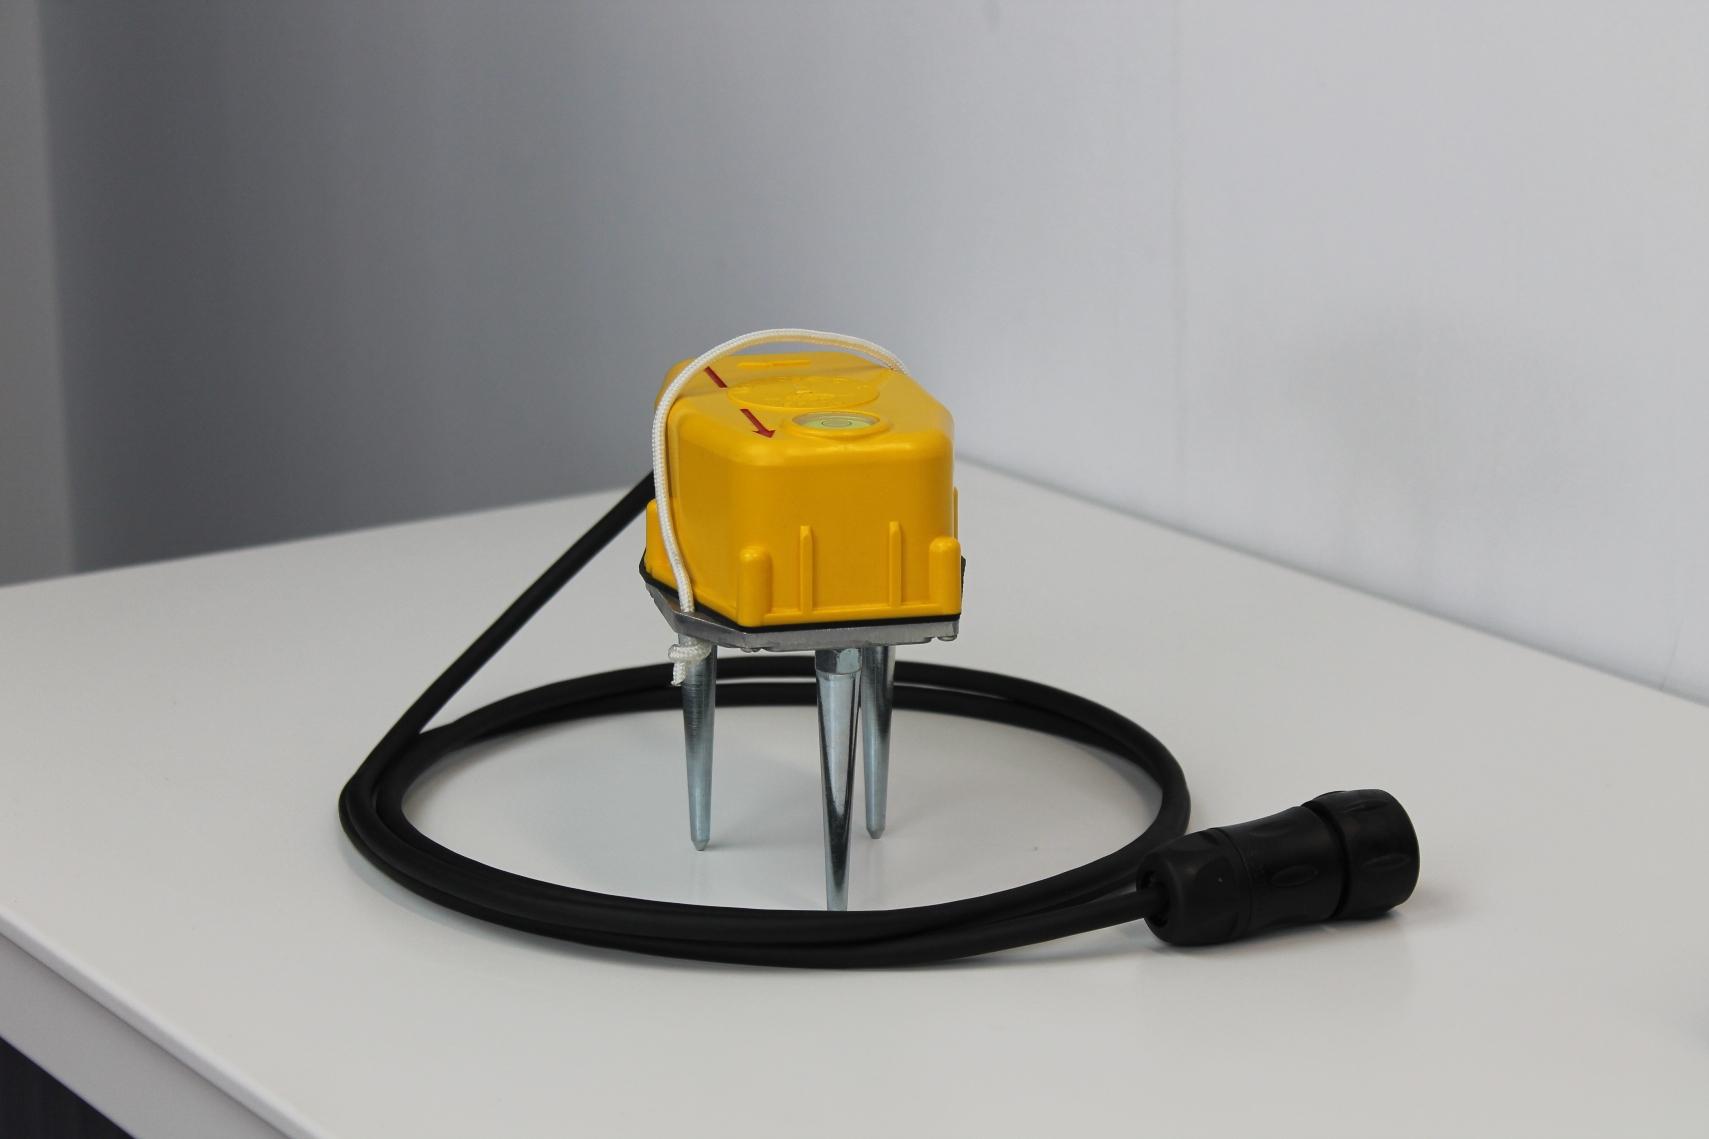 Ground vibration sensor